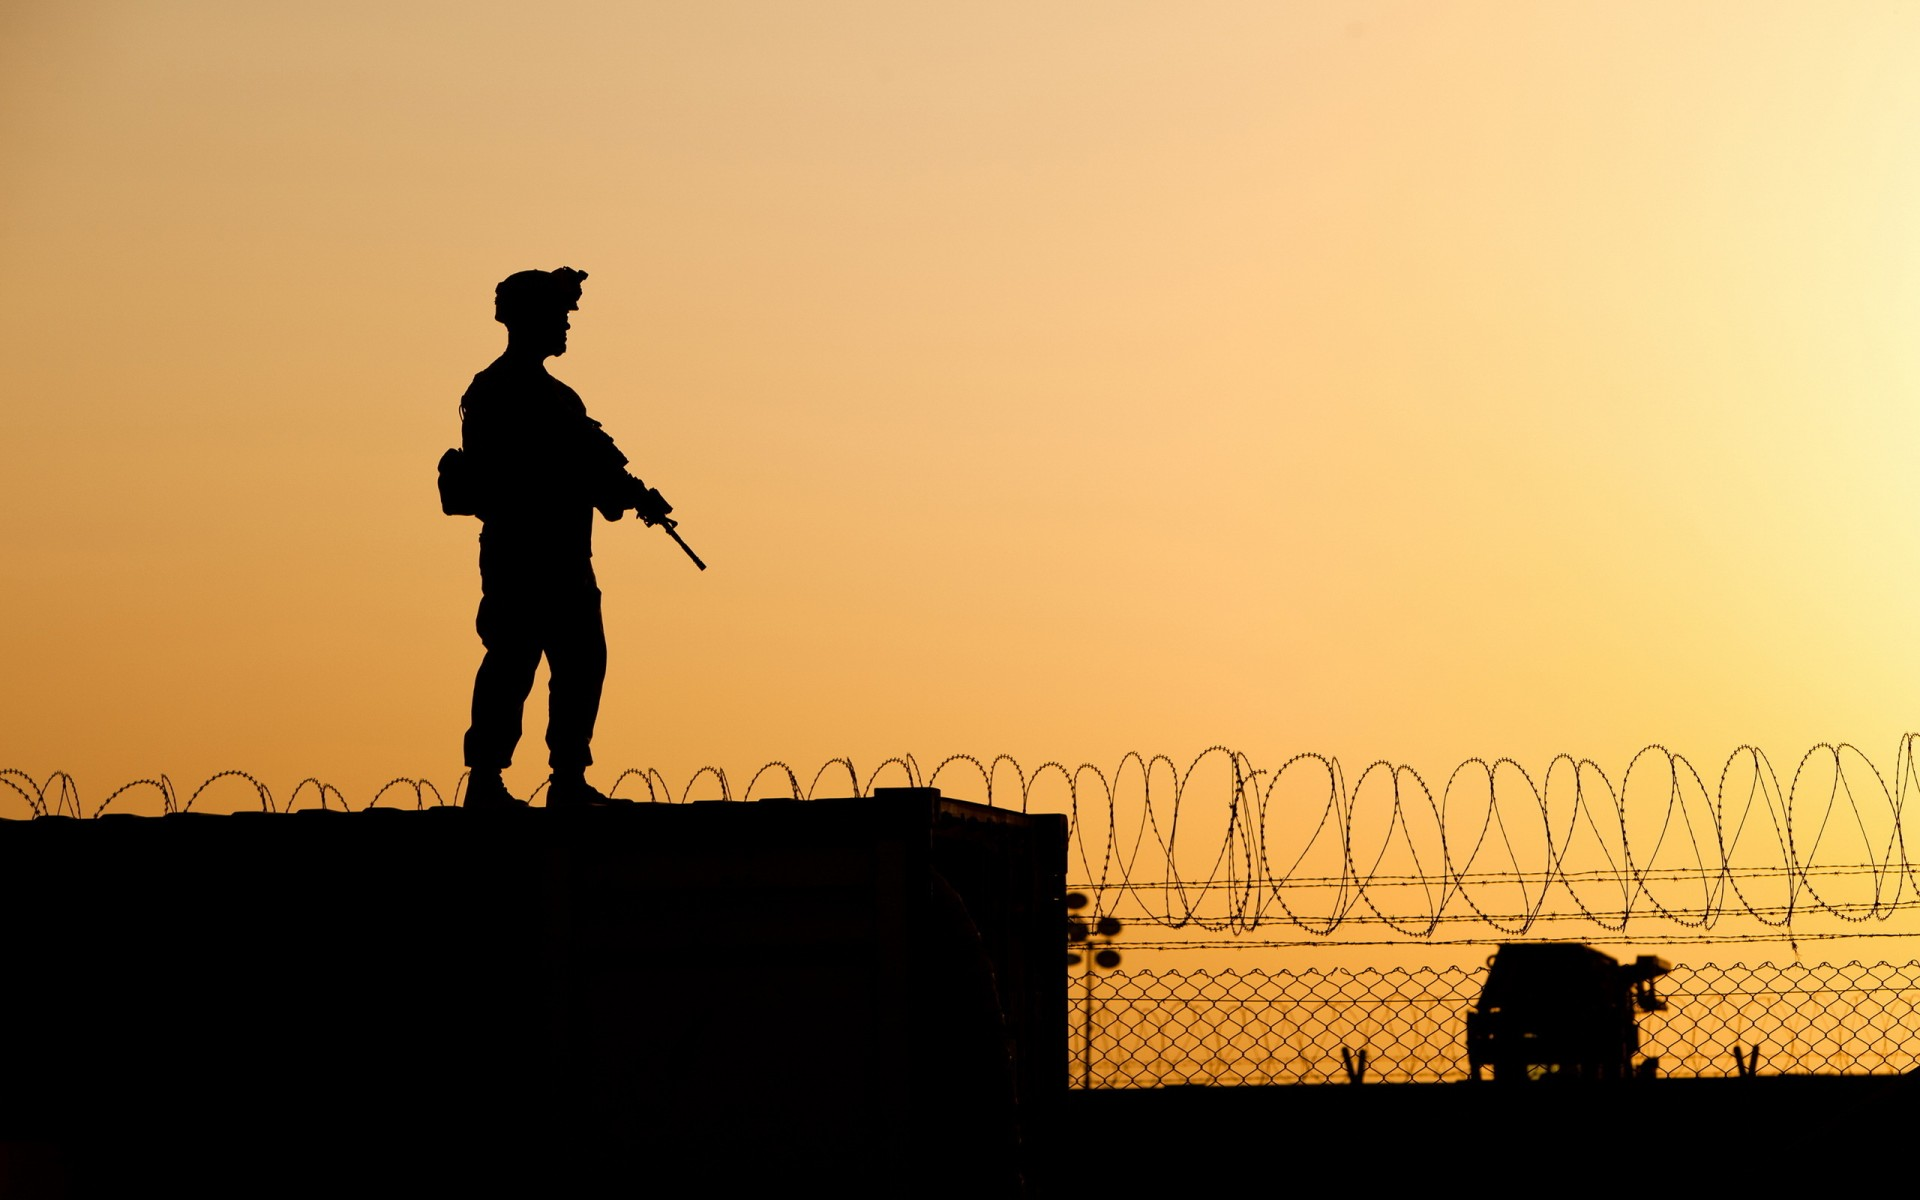 Silhouette Mood Military War Warriors Soldiers Weapons Guns Assault